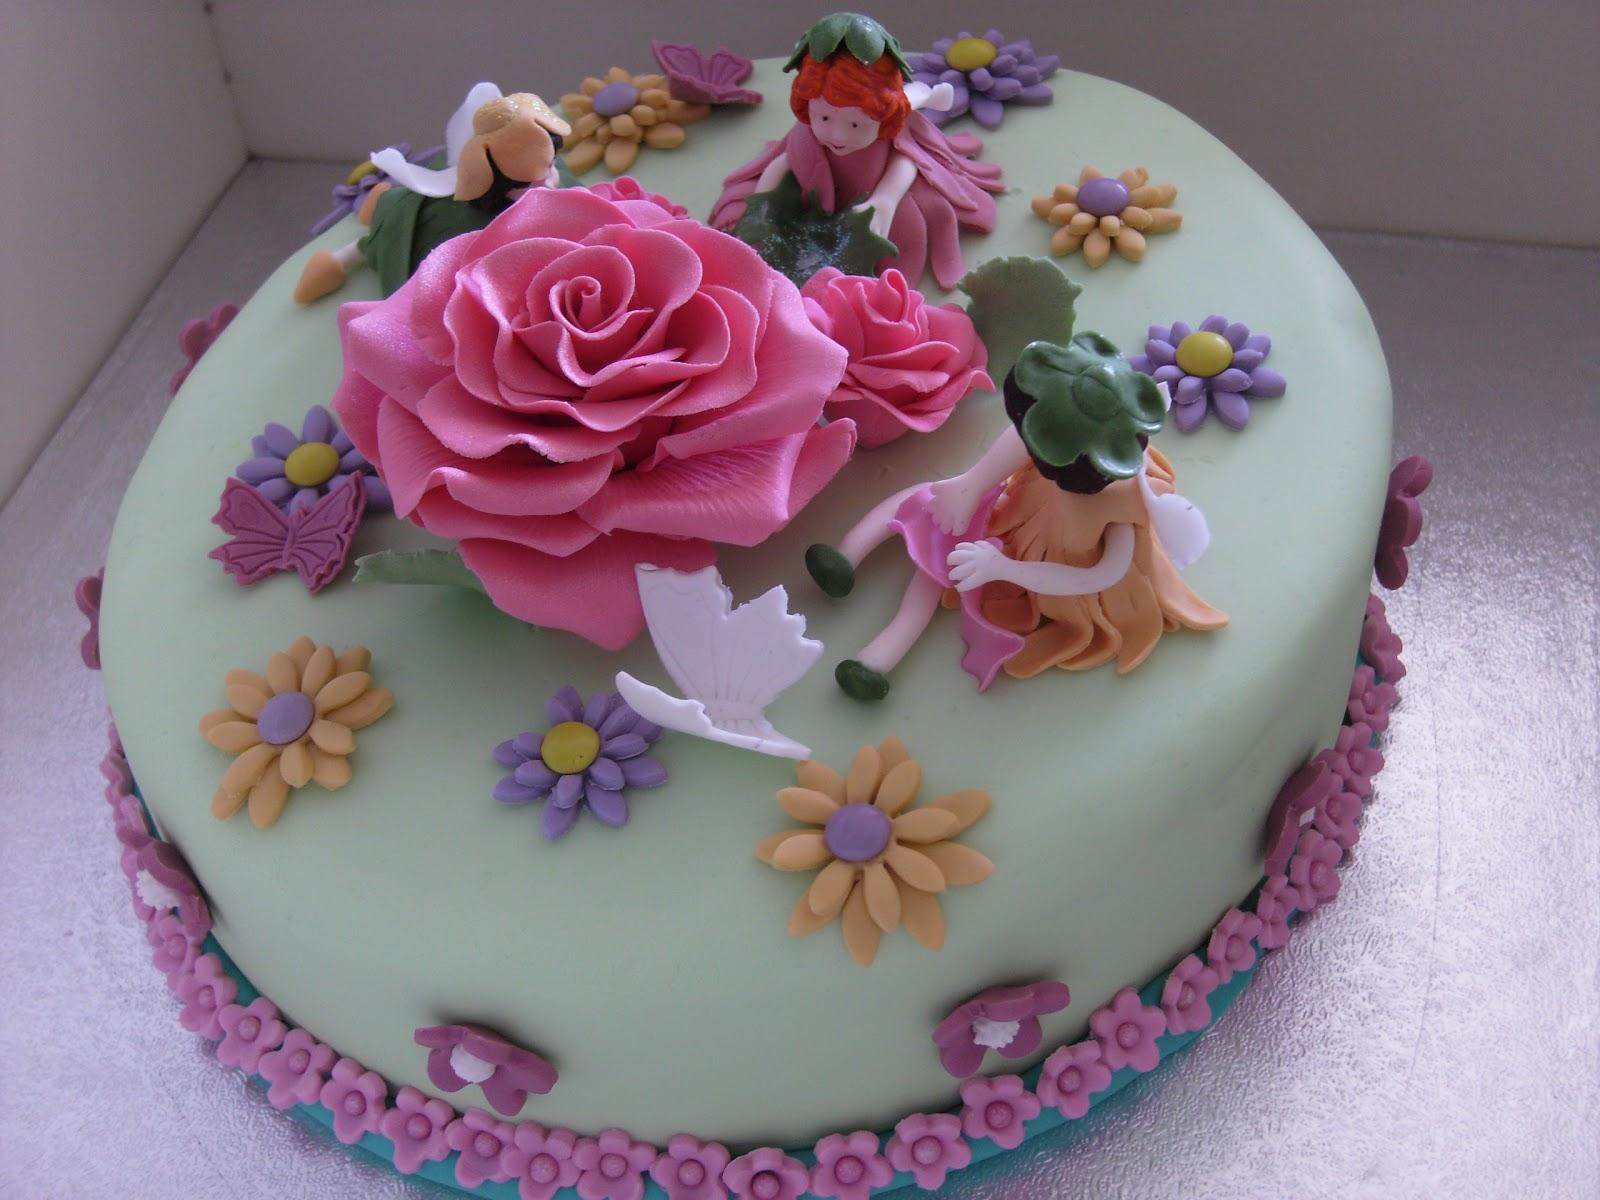 Pleasant 10 Birthday Cakes With Flowers On Them Photo Birthday Cake With Funny Birthday Cards Online Hetedamsfinfo